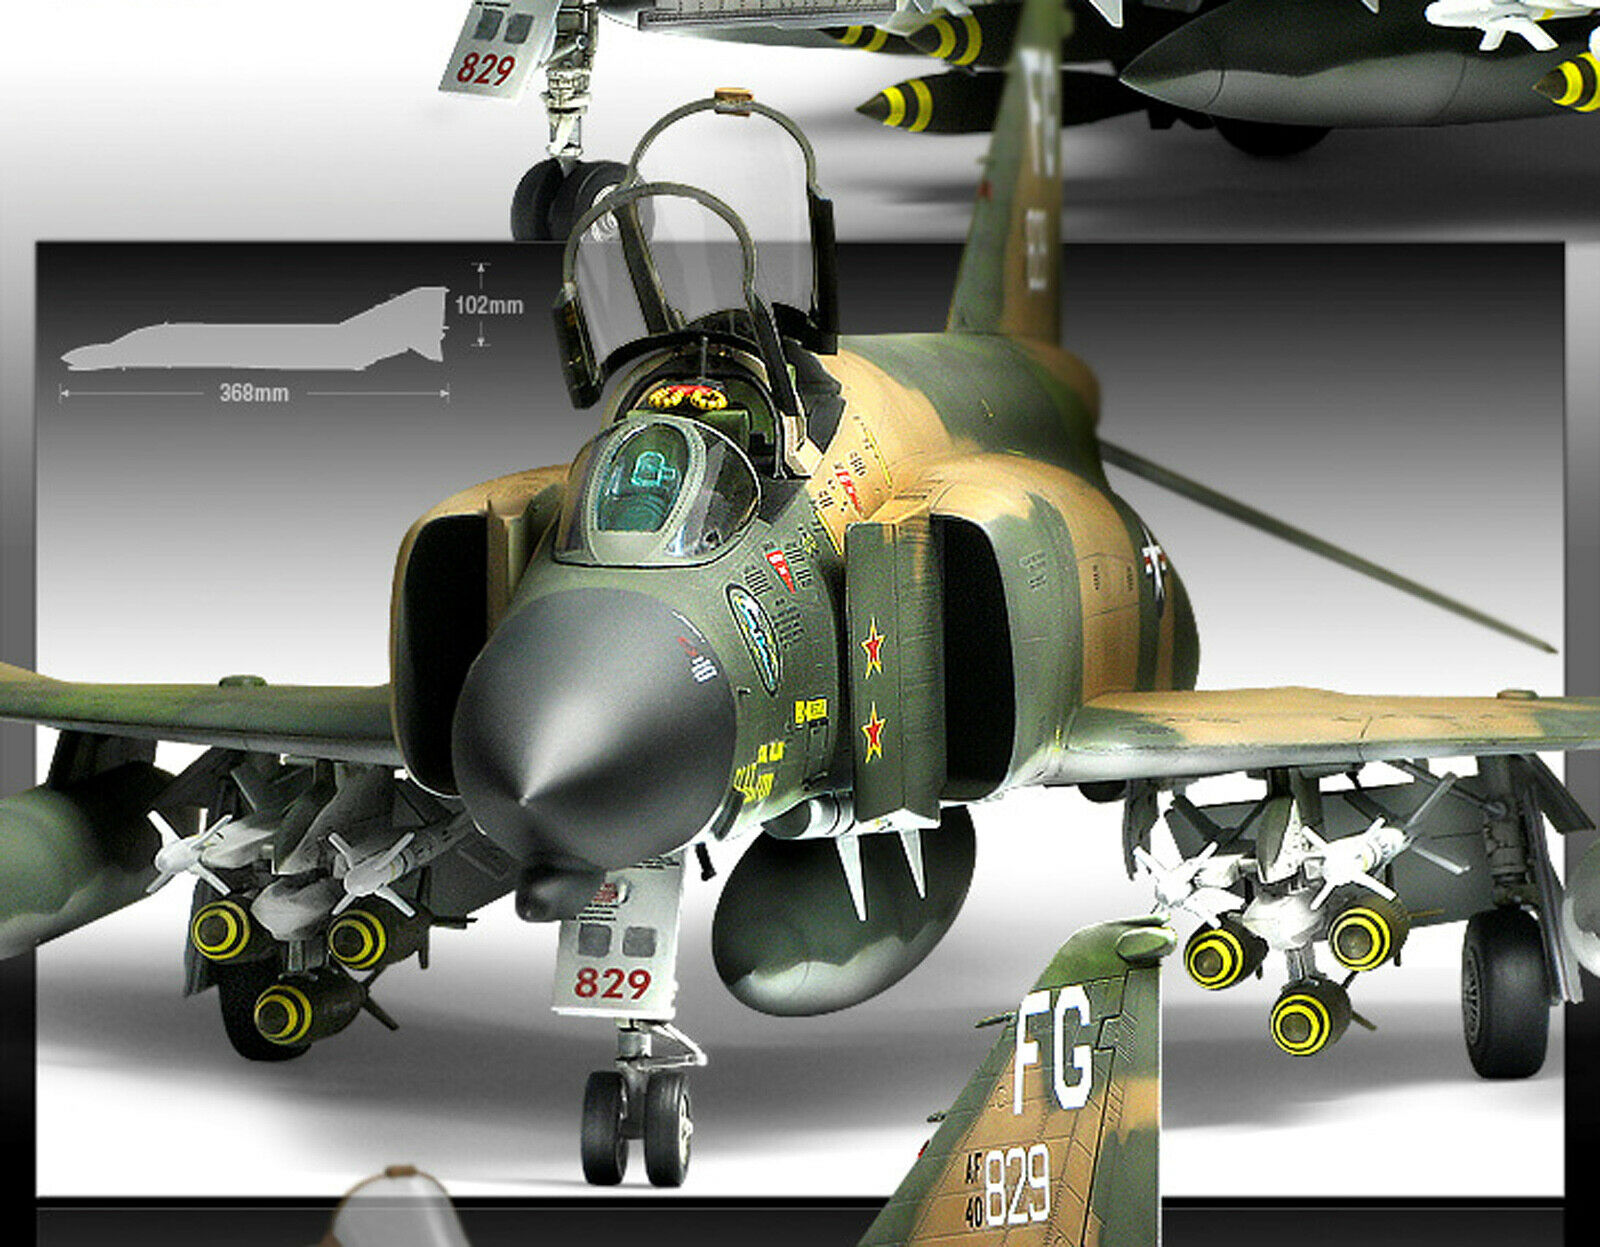 [ACADEMY] 1 48 Assembly F-4C Vietnam War  12294  U. S. Aircraft Model Kit